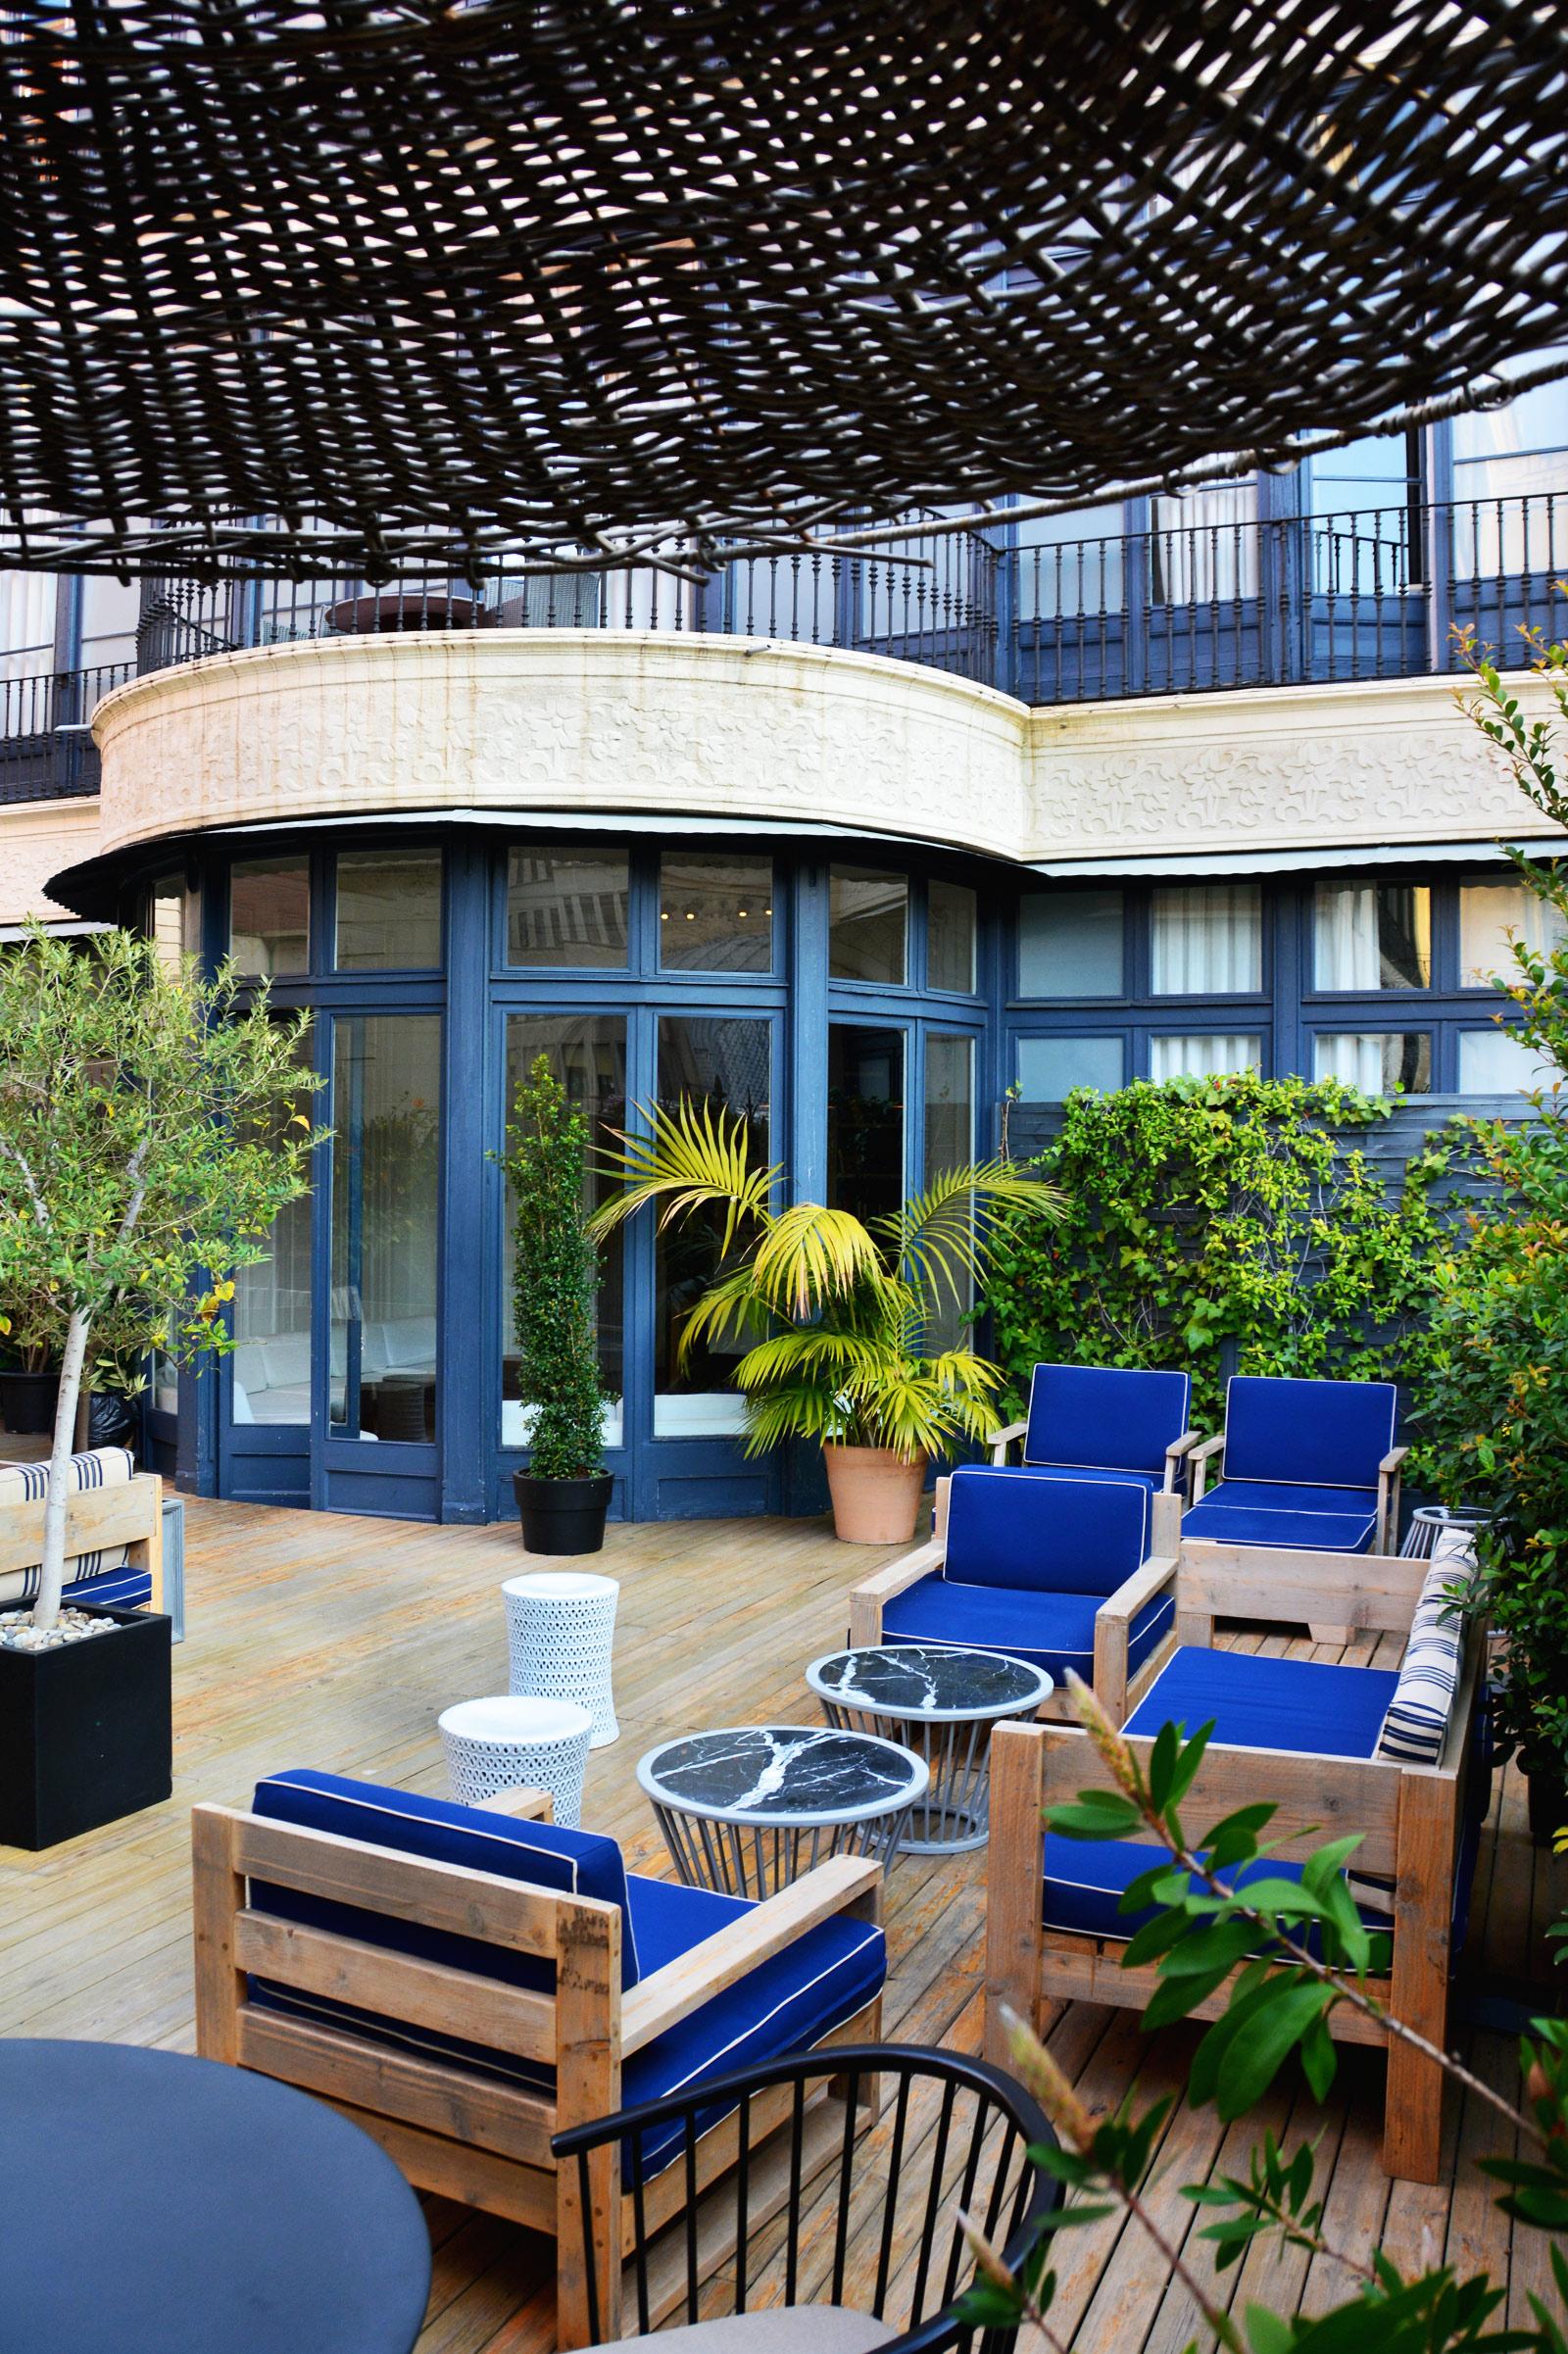 praktik-hotel-rambla_barcelona_19